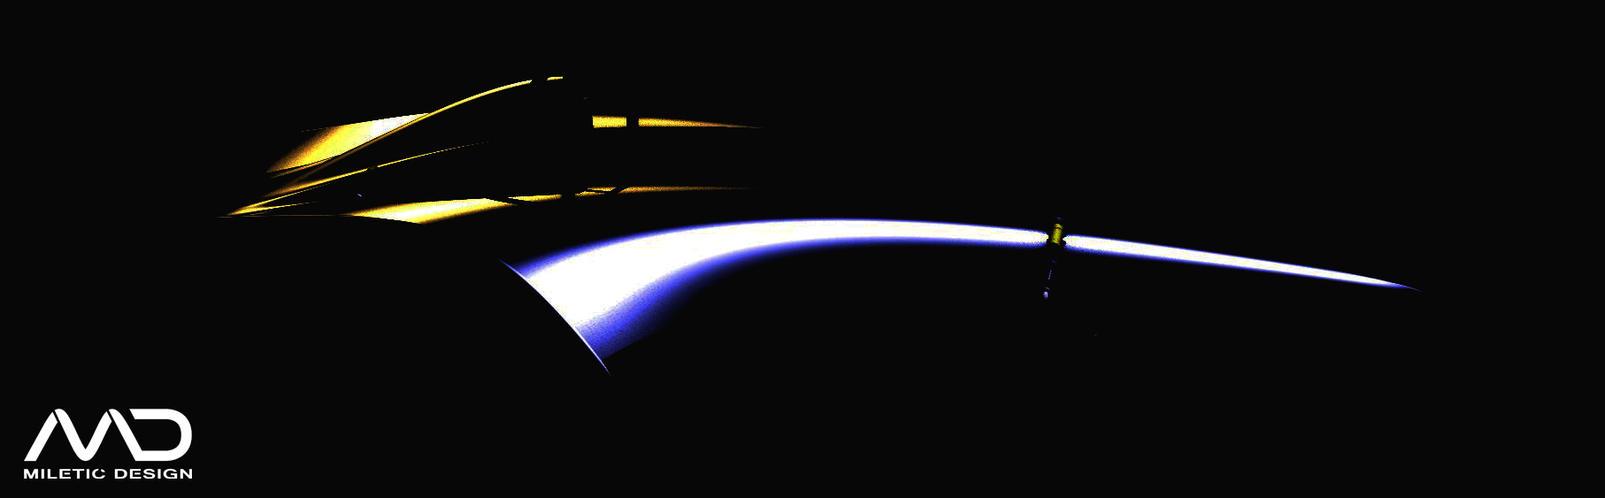 Riteh Racing Team - Formula Car Teaser by Morfiuss